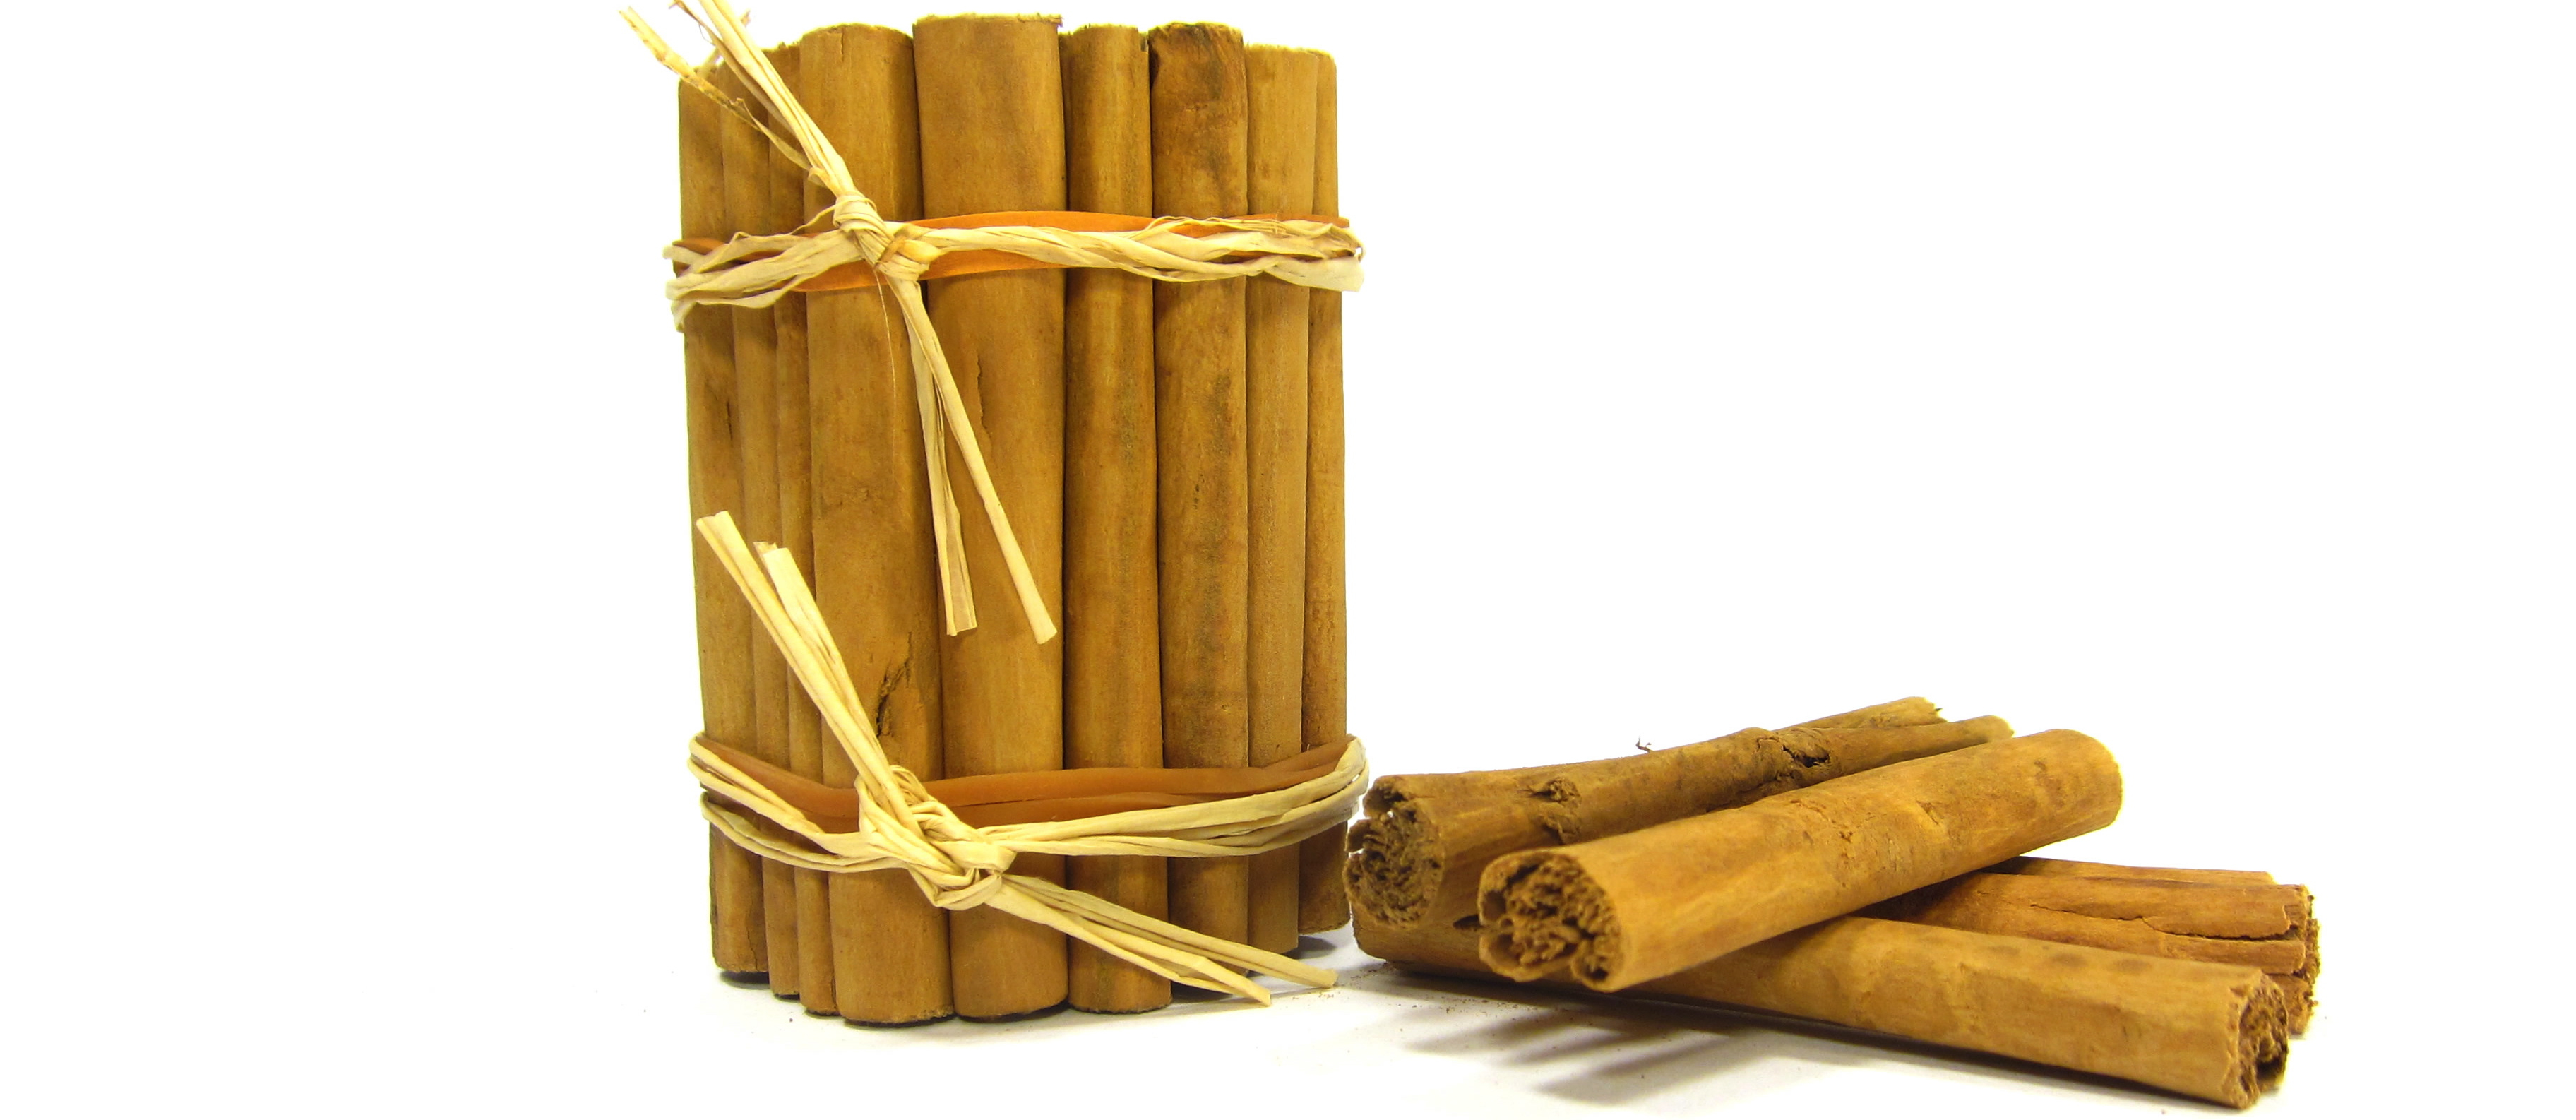 Does Cinnamon Help Lower Blood Sugars?